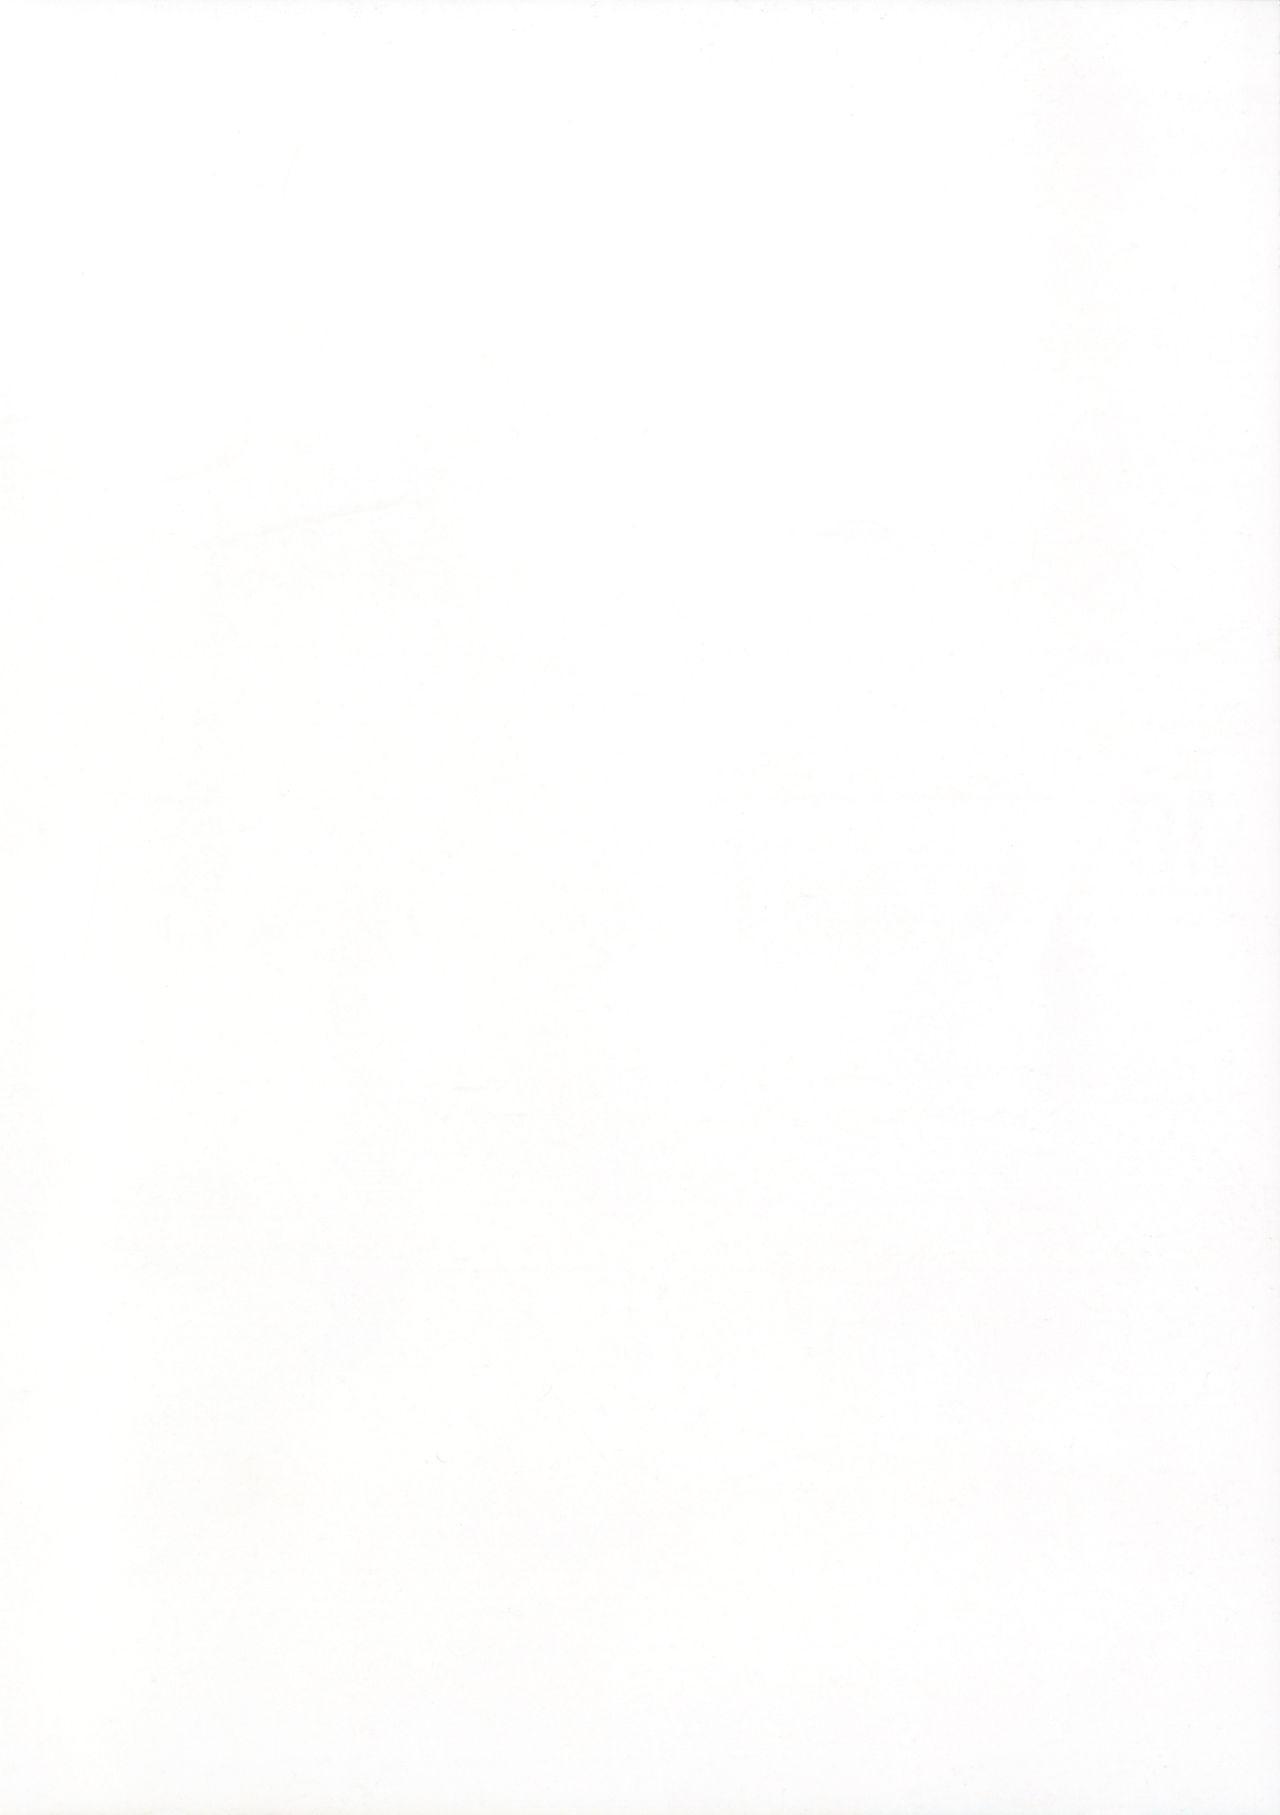 Jeanne Alter ni Onegai Shitai? + Omake Shikishi | Did you ask Jeanne alter? + Bonus Color Page 1